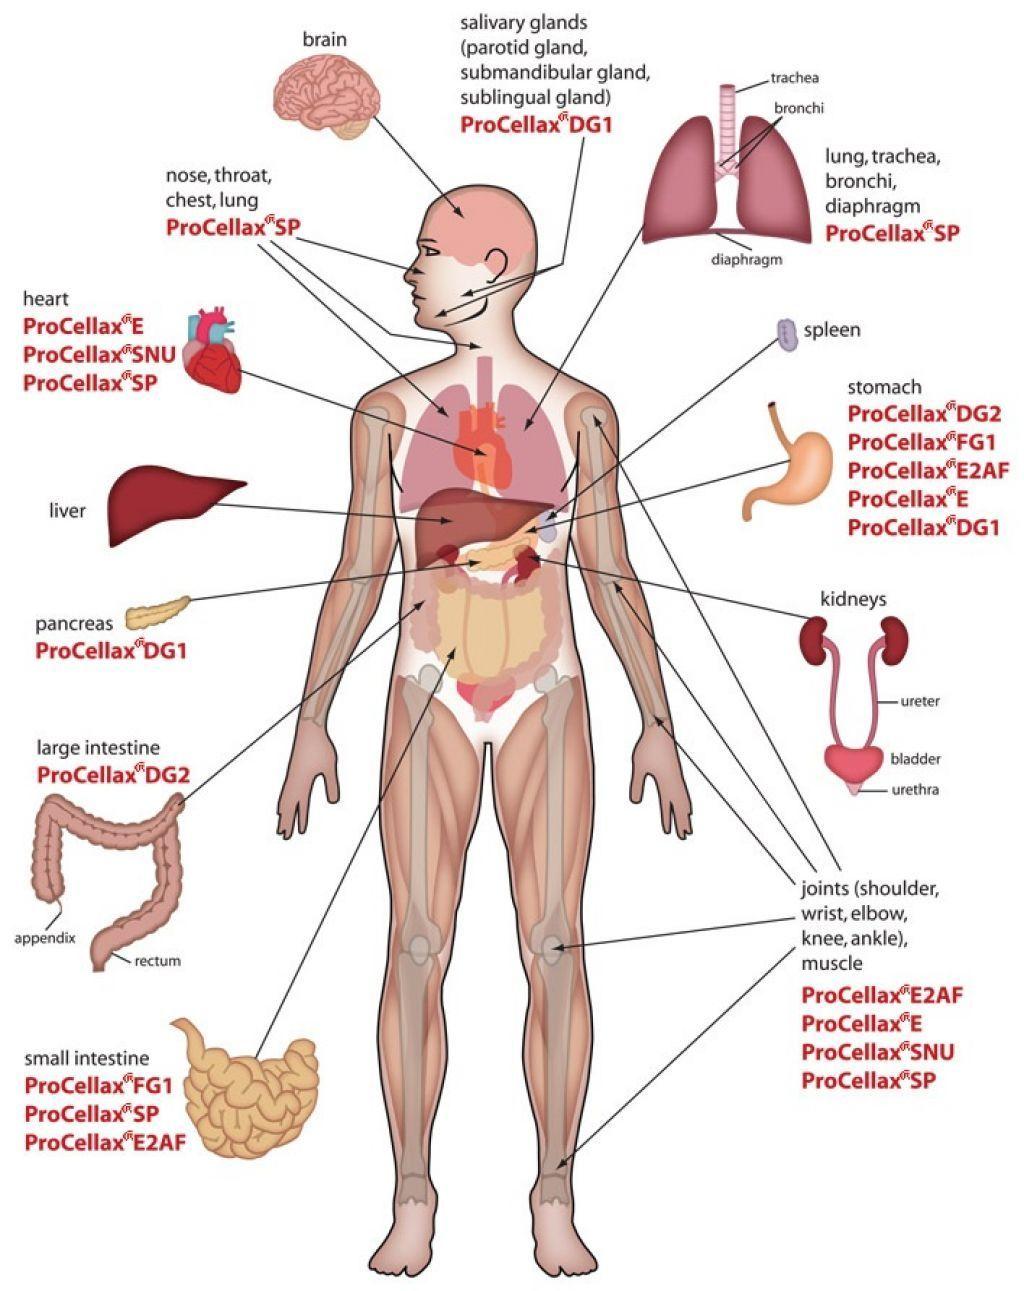 Human Body Diagram Appendix Human Body Anatomy Pinterest Human